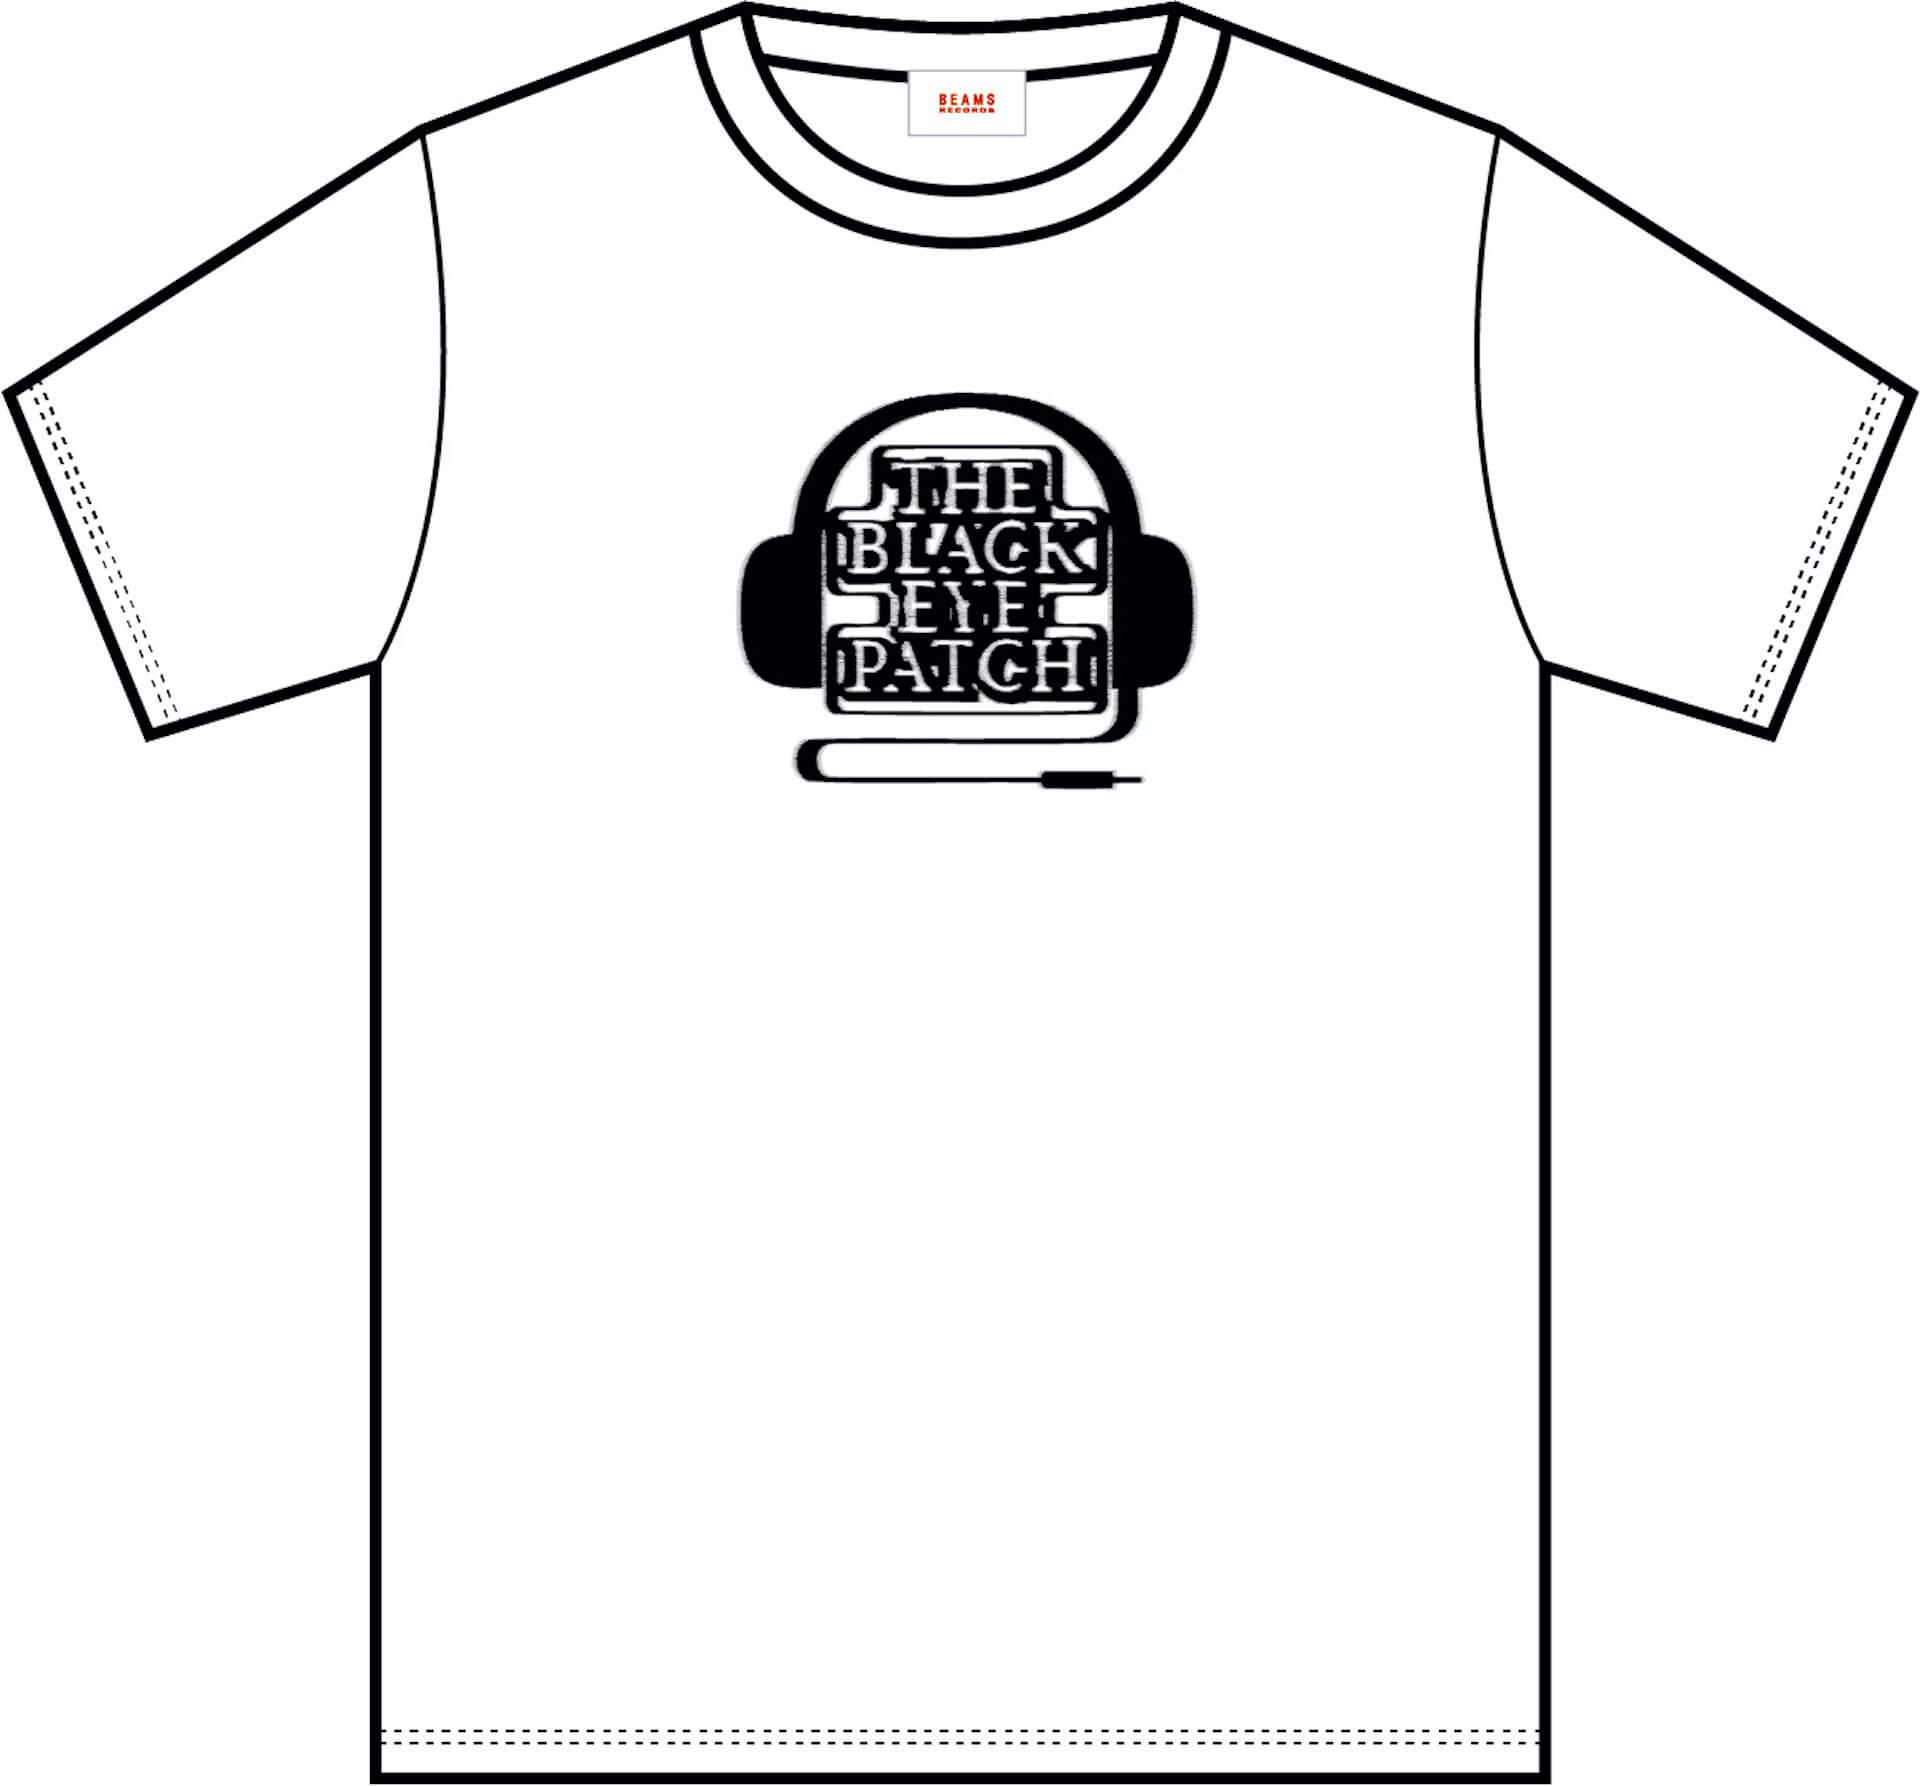 J-WAVE × BEAMS RECORDSのTシャツ第2弾が受注販売開始!本秀康、cherry chill will、TOWA TEIらが参加 music200612_jwave_beamsrecords_07